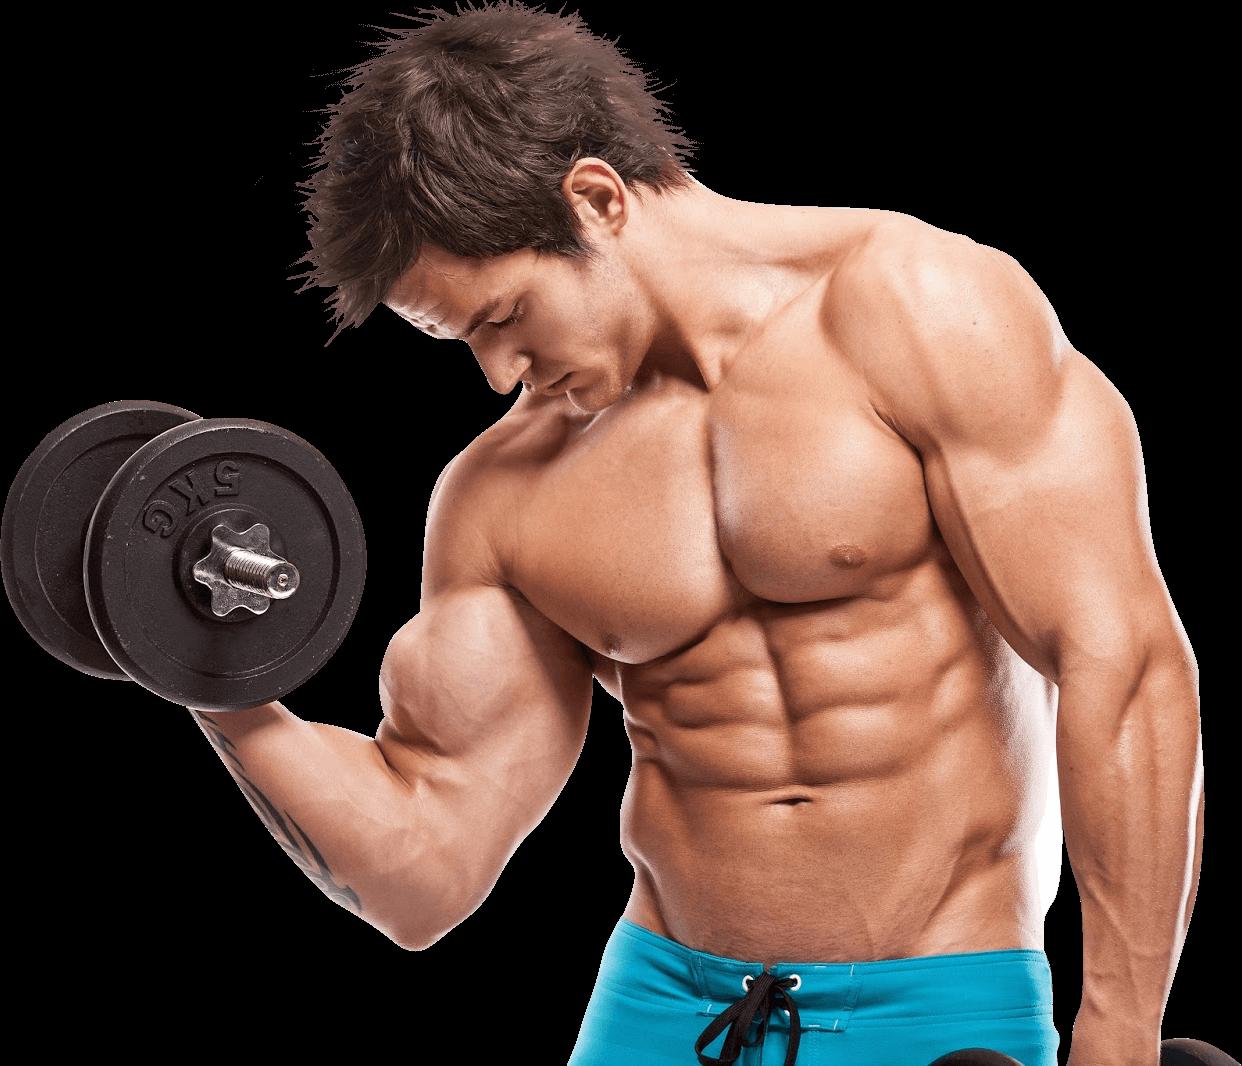 bodybuilder-met-gewicht